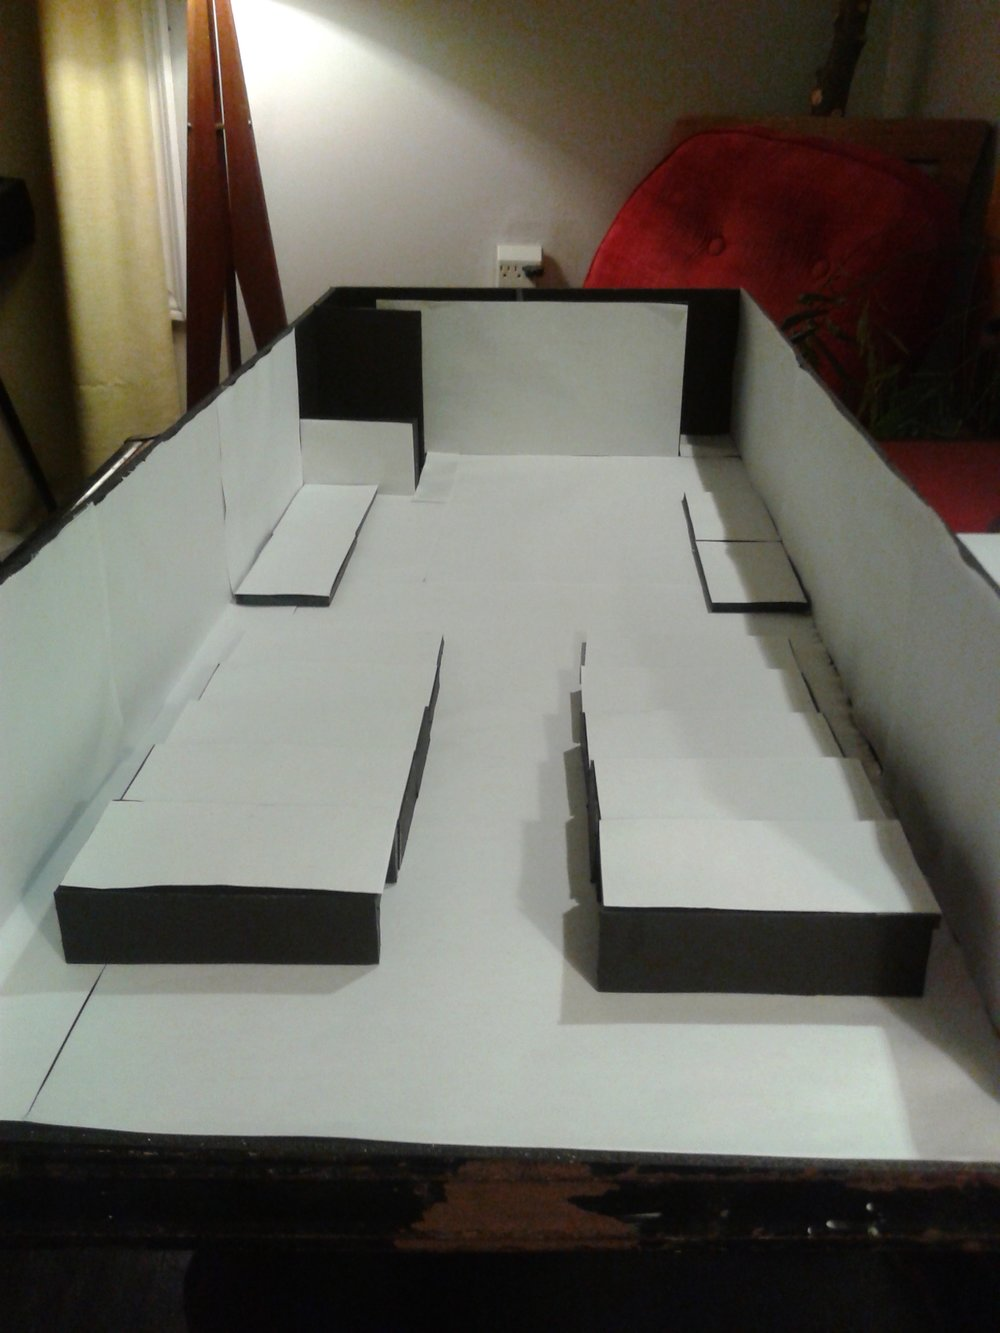 Model box for 'Liver'